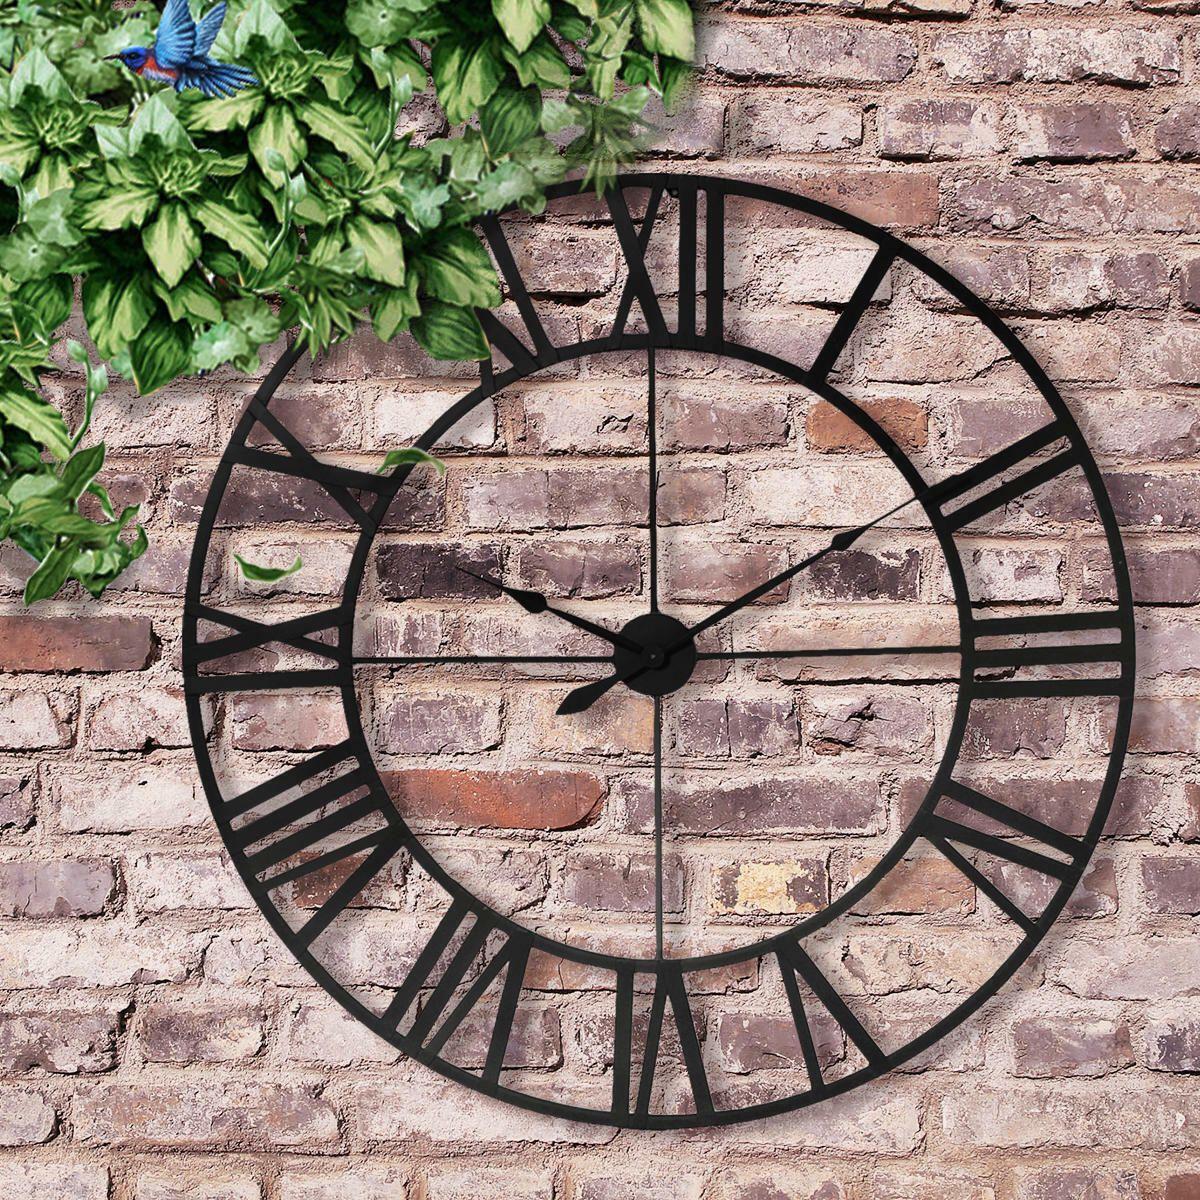 16 23 Large Outdoor Garden Wall Clock Antique Roman Numeral Round Open Face 22 99 Outdoor Cloc Outdoor Wall Clocks Large Outdoor Wall Clock Outdoor Clock